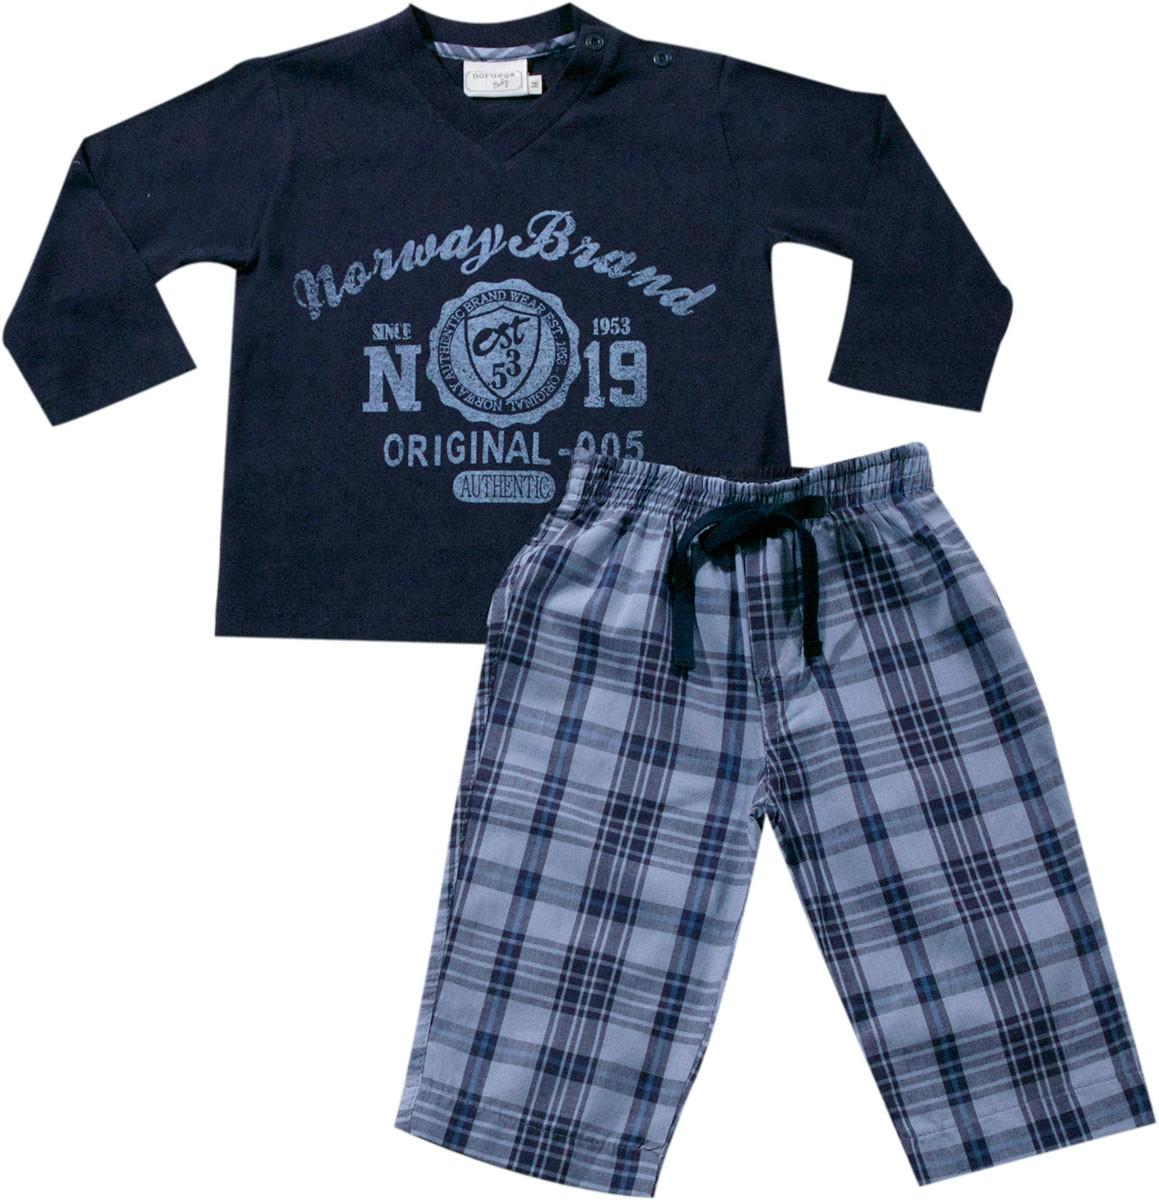 61.016 - Conjunto Pijama Xadrez